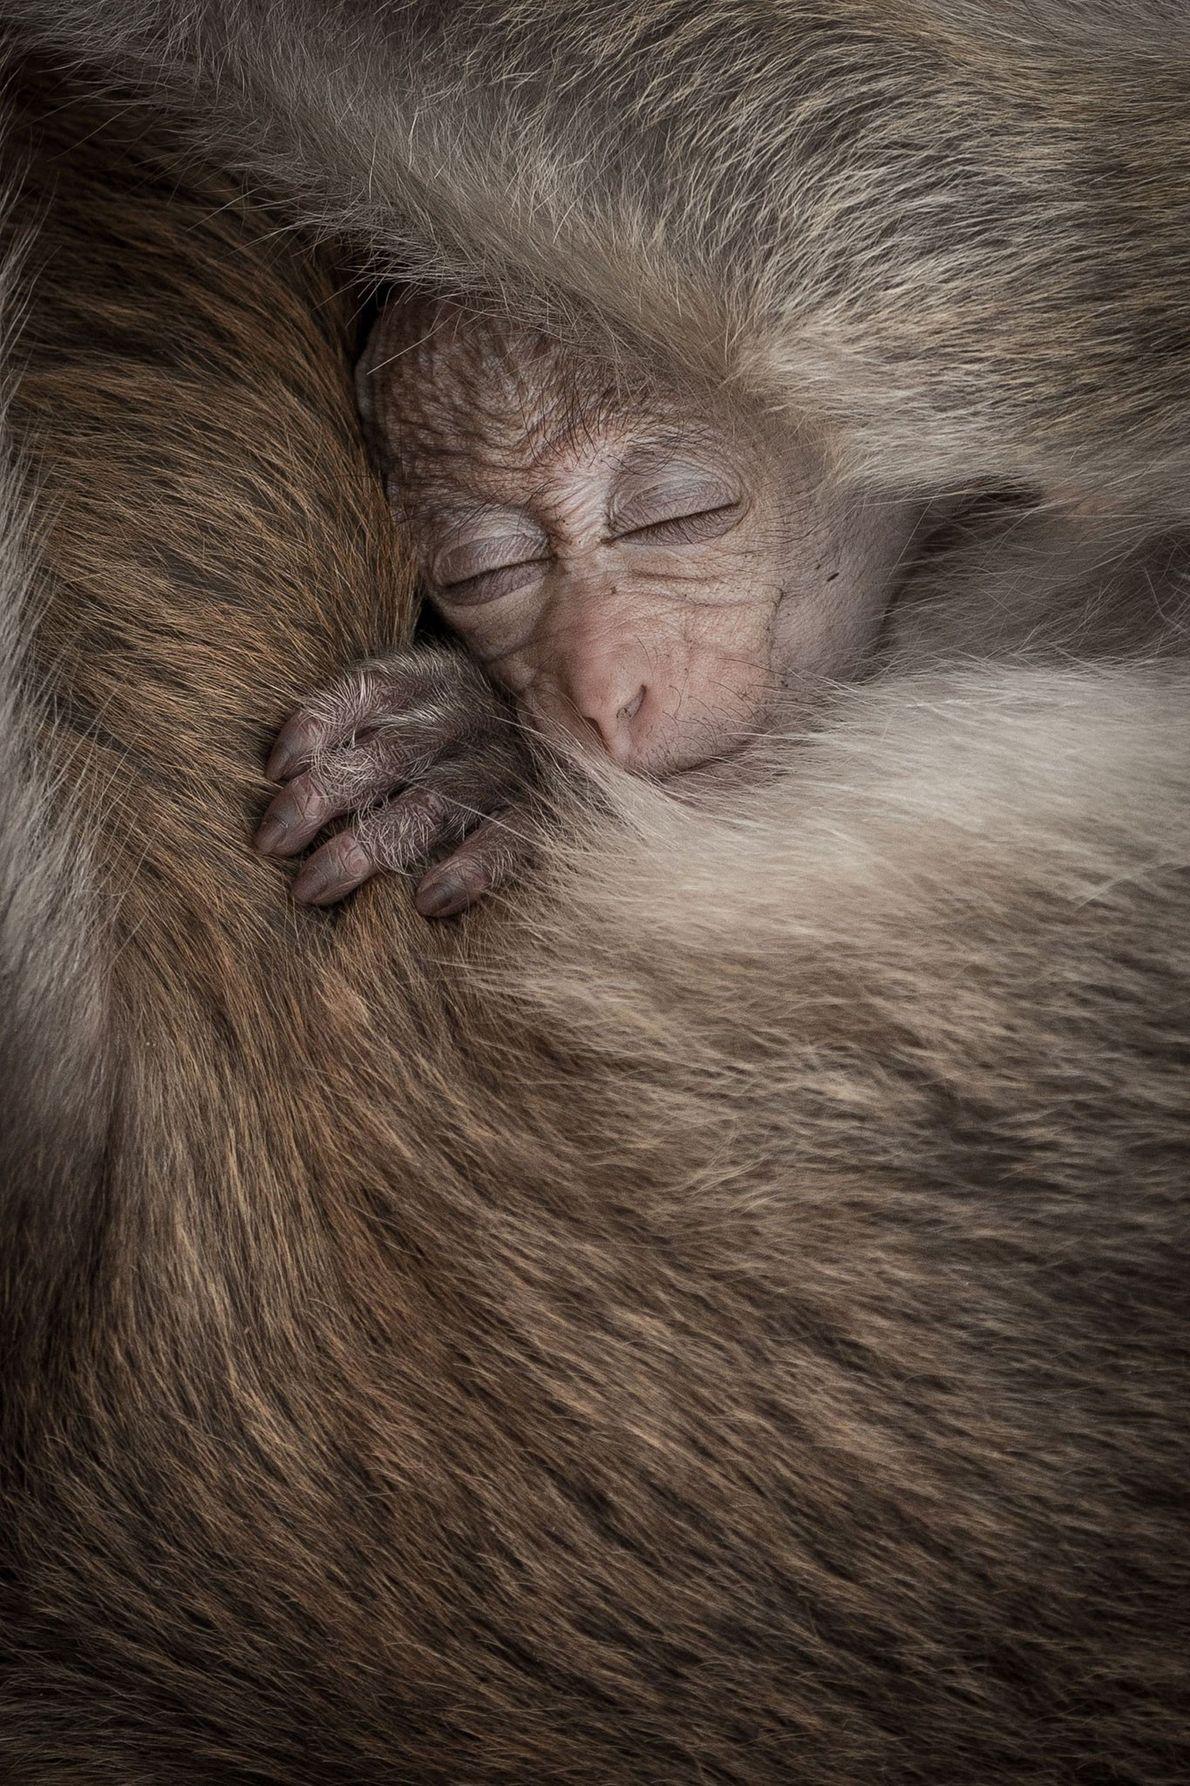 Senthi Aathavan Sethiverl, fotógrafo de Your Shot, capturó este momento entre un bebé mono y su ...